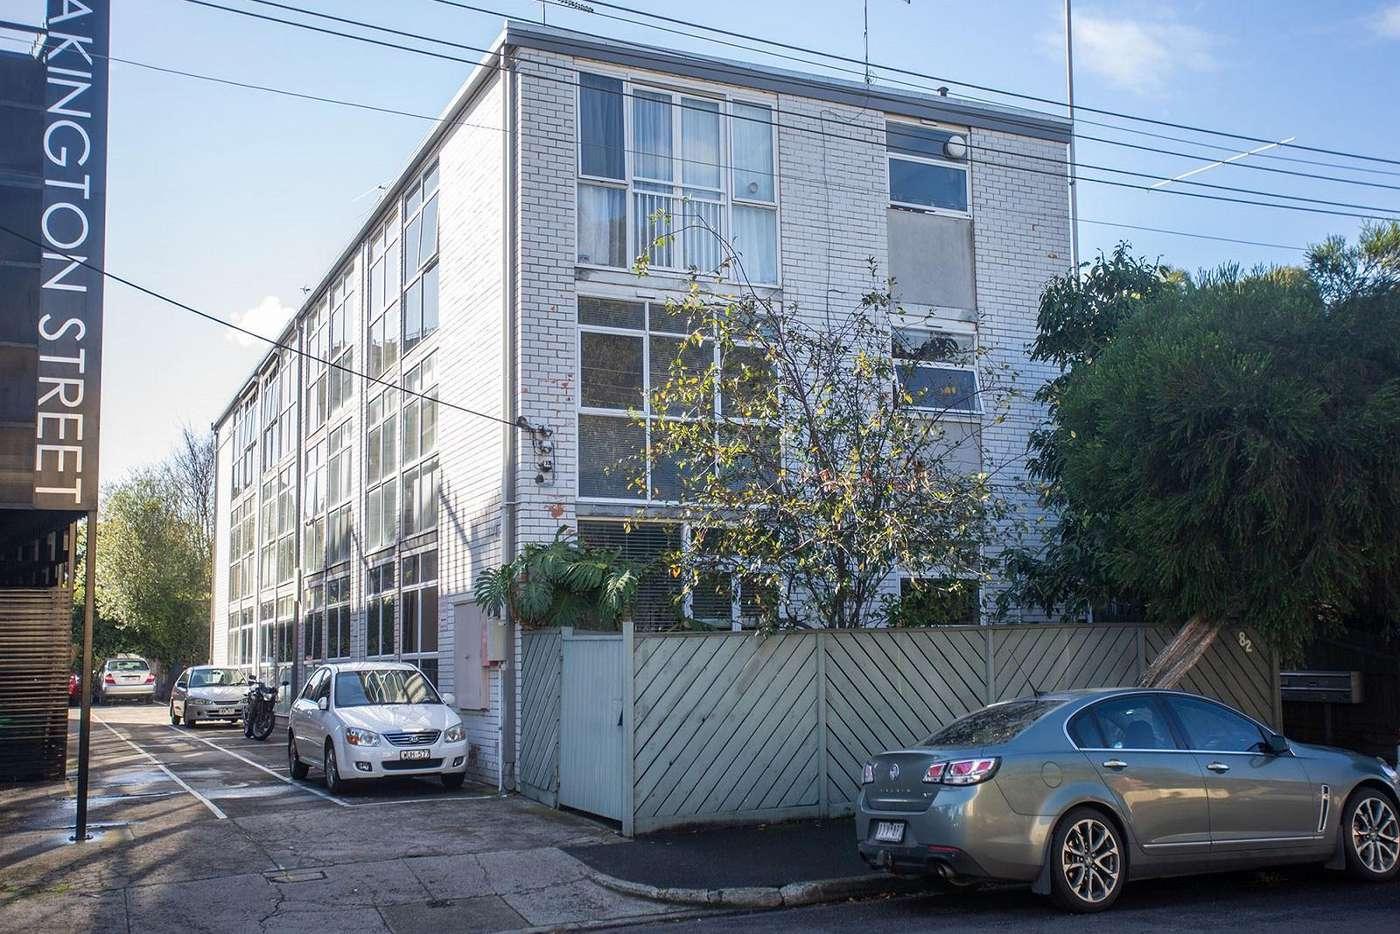 Main view of Homely apartment listing, 12/82 Pakington Street, St Kilda VIC 3182